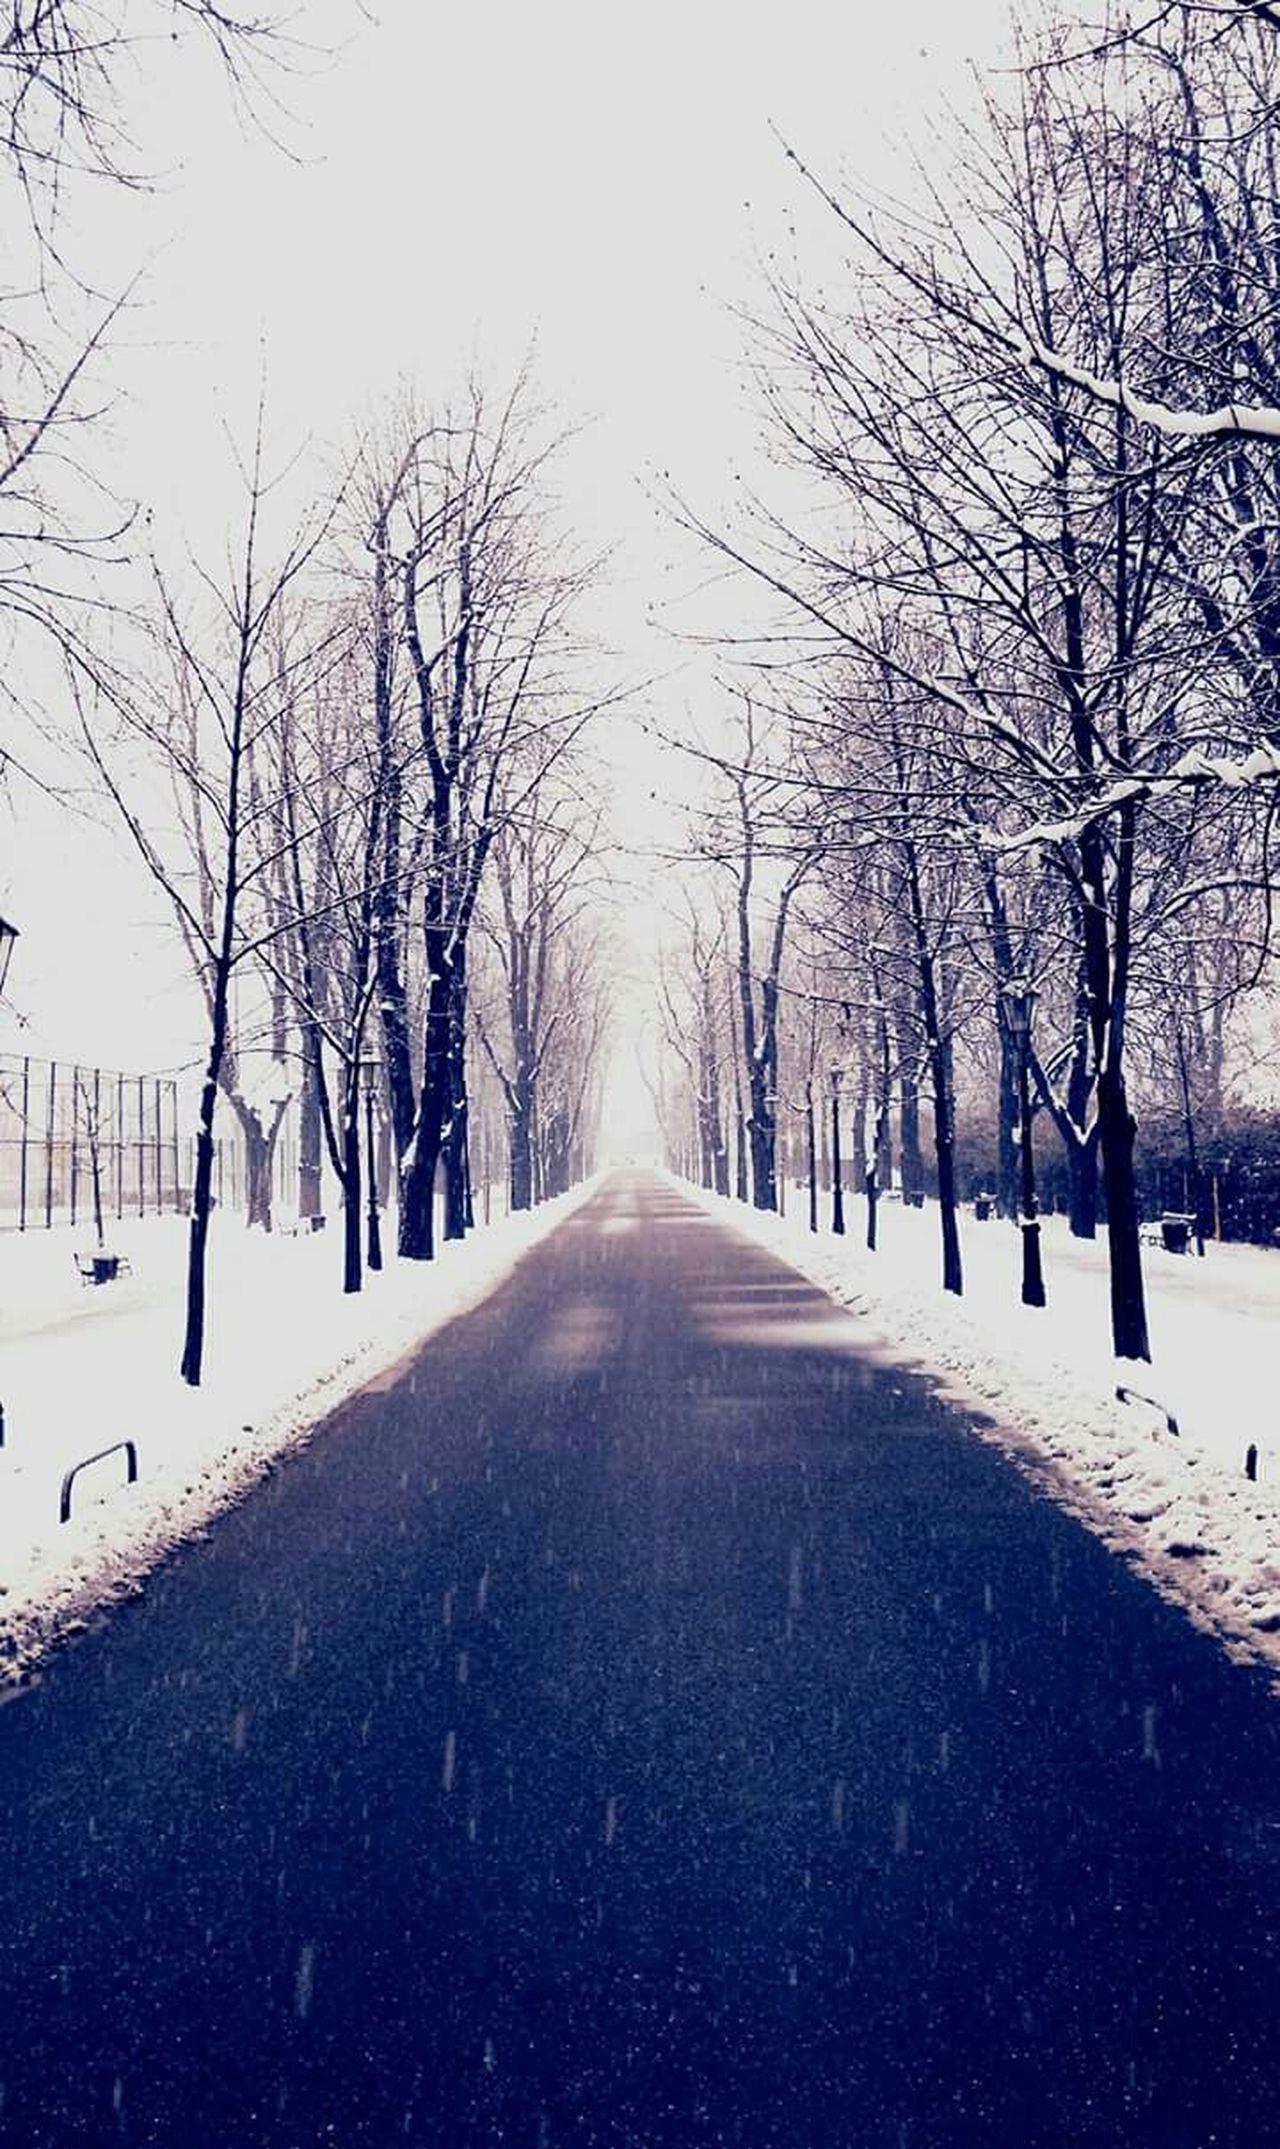 Winter Snow ❄ Zagreb, Croatia Zagreb Tak Imam Te Rad Zagreb U Srcu Vrapce Vrapcanska Aleja Zagreb Zapad